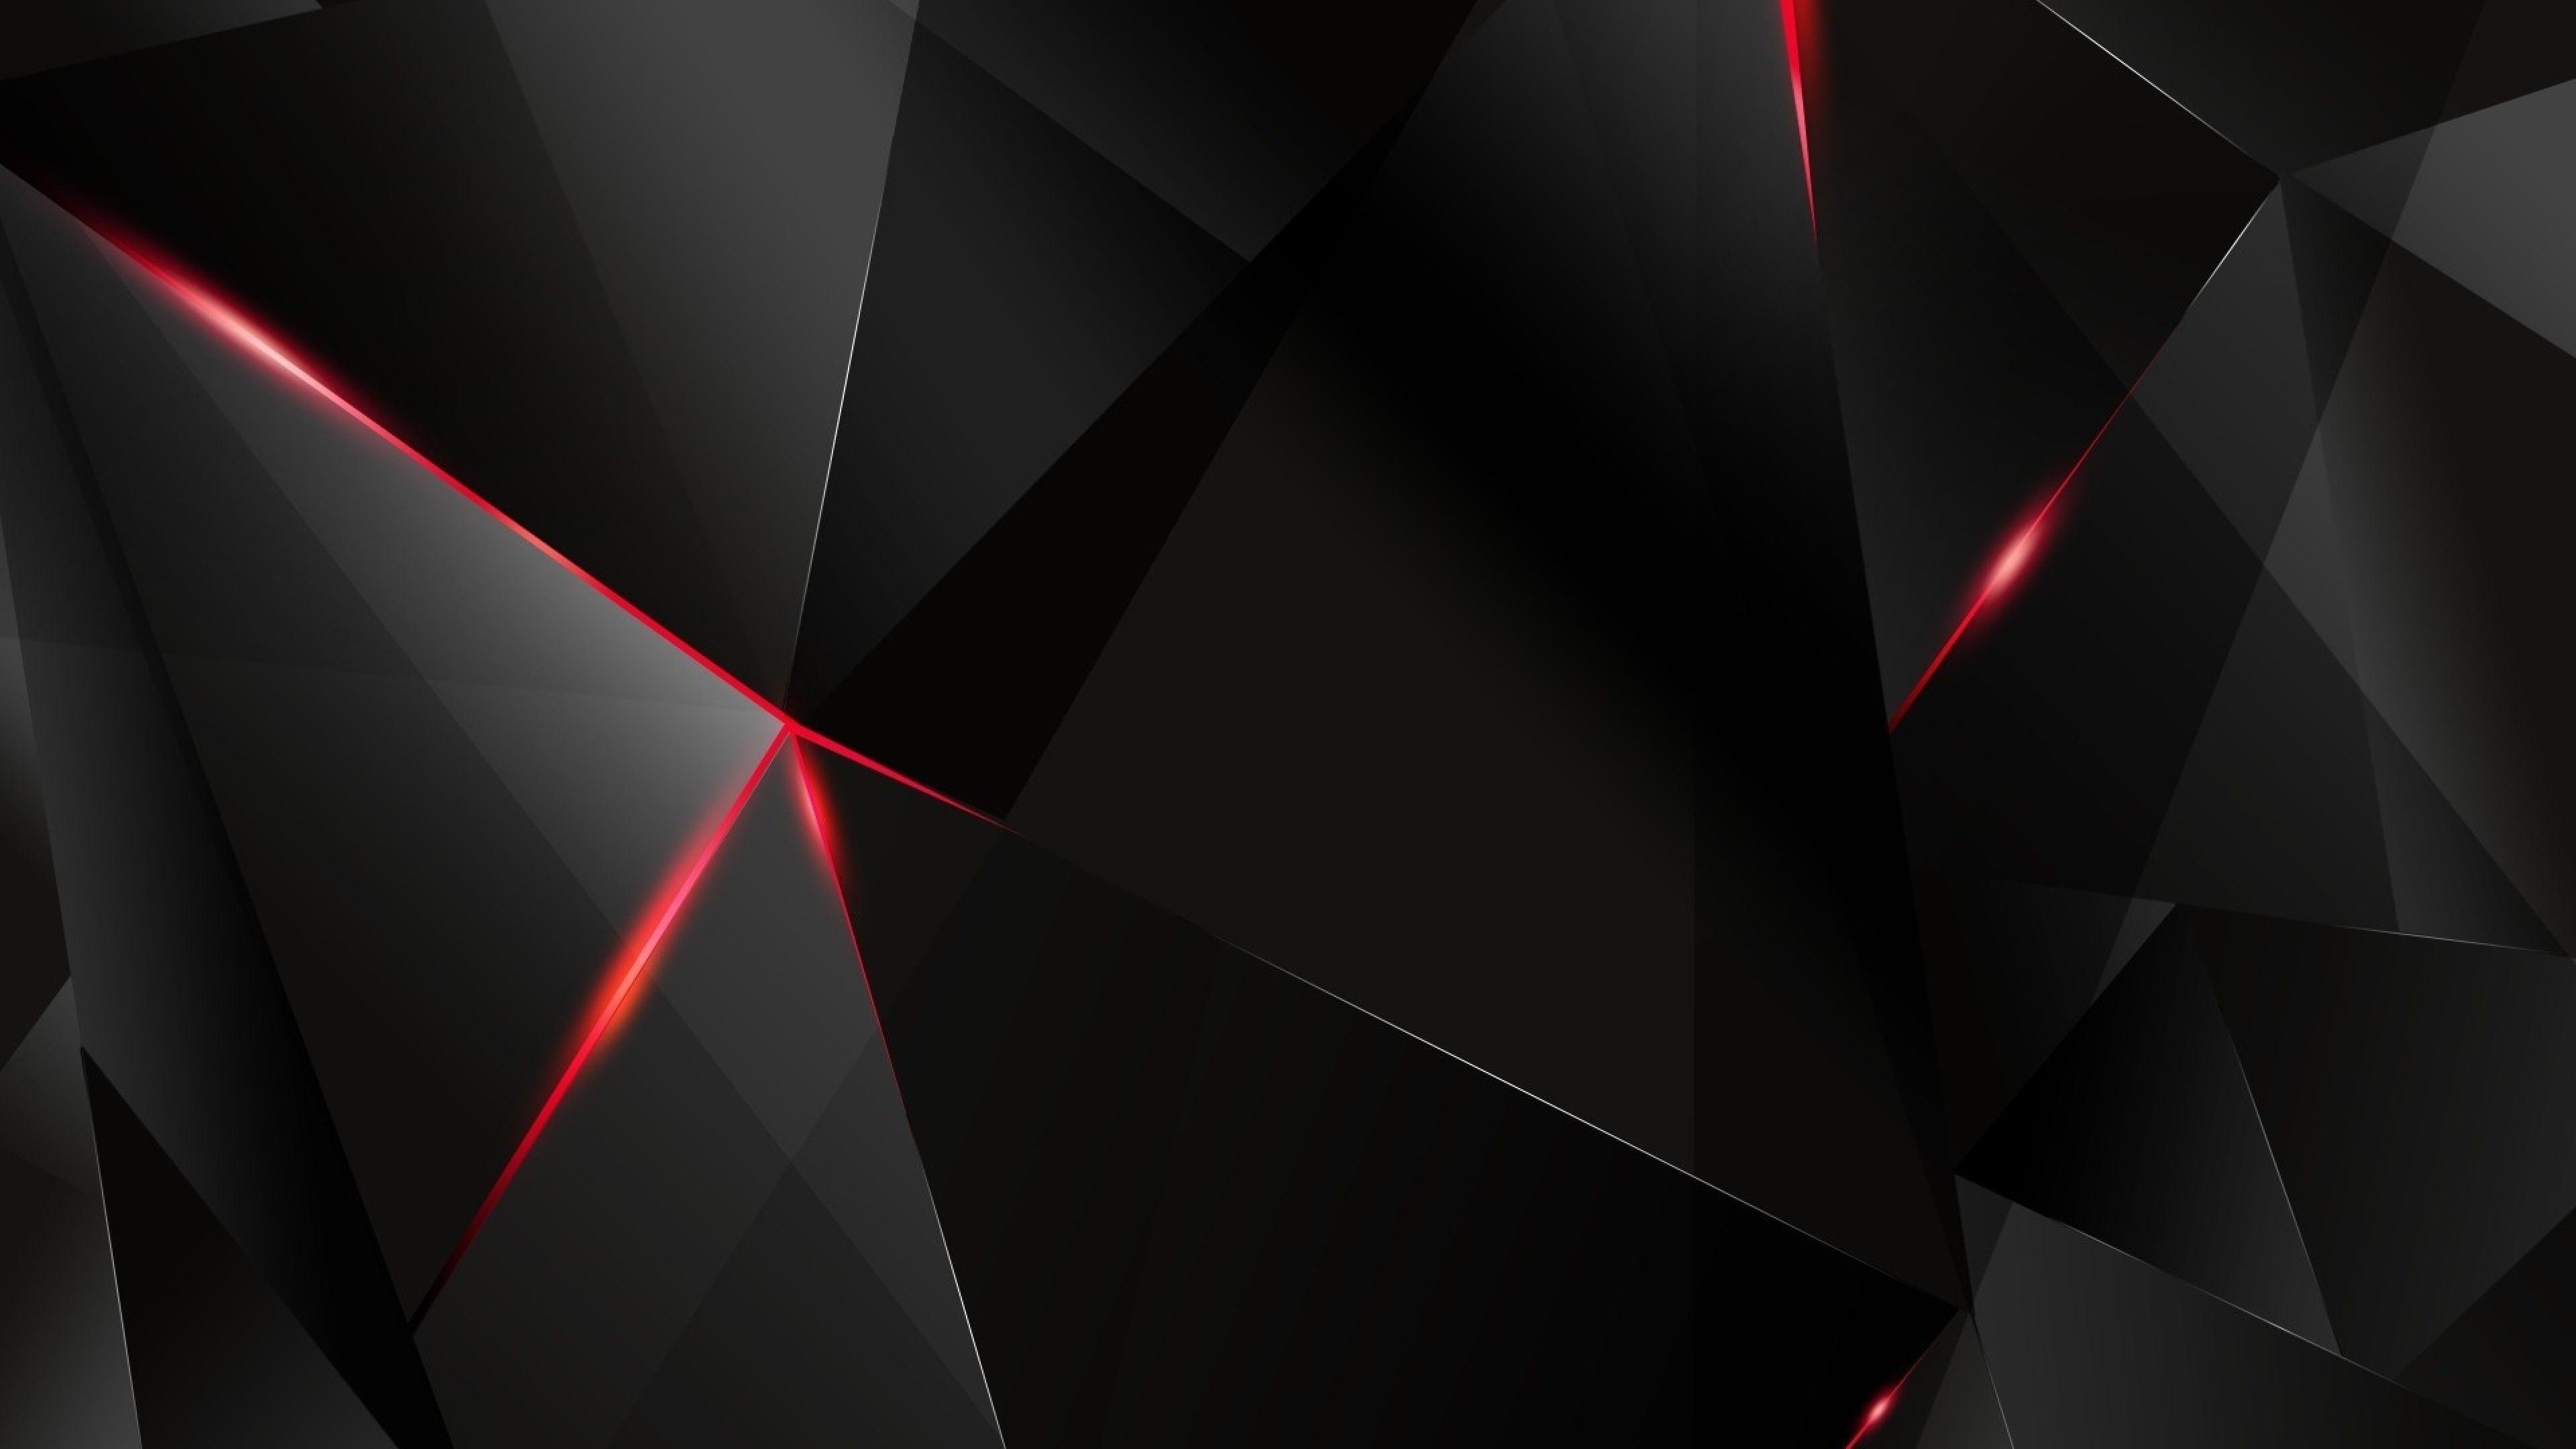 3840x2160 Preview Wallpaper Black Light Dark Figures 3840x2160 Red And Black Wallpaper Dark Black Wallpaper Dark Wallpaper